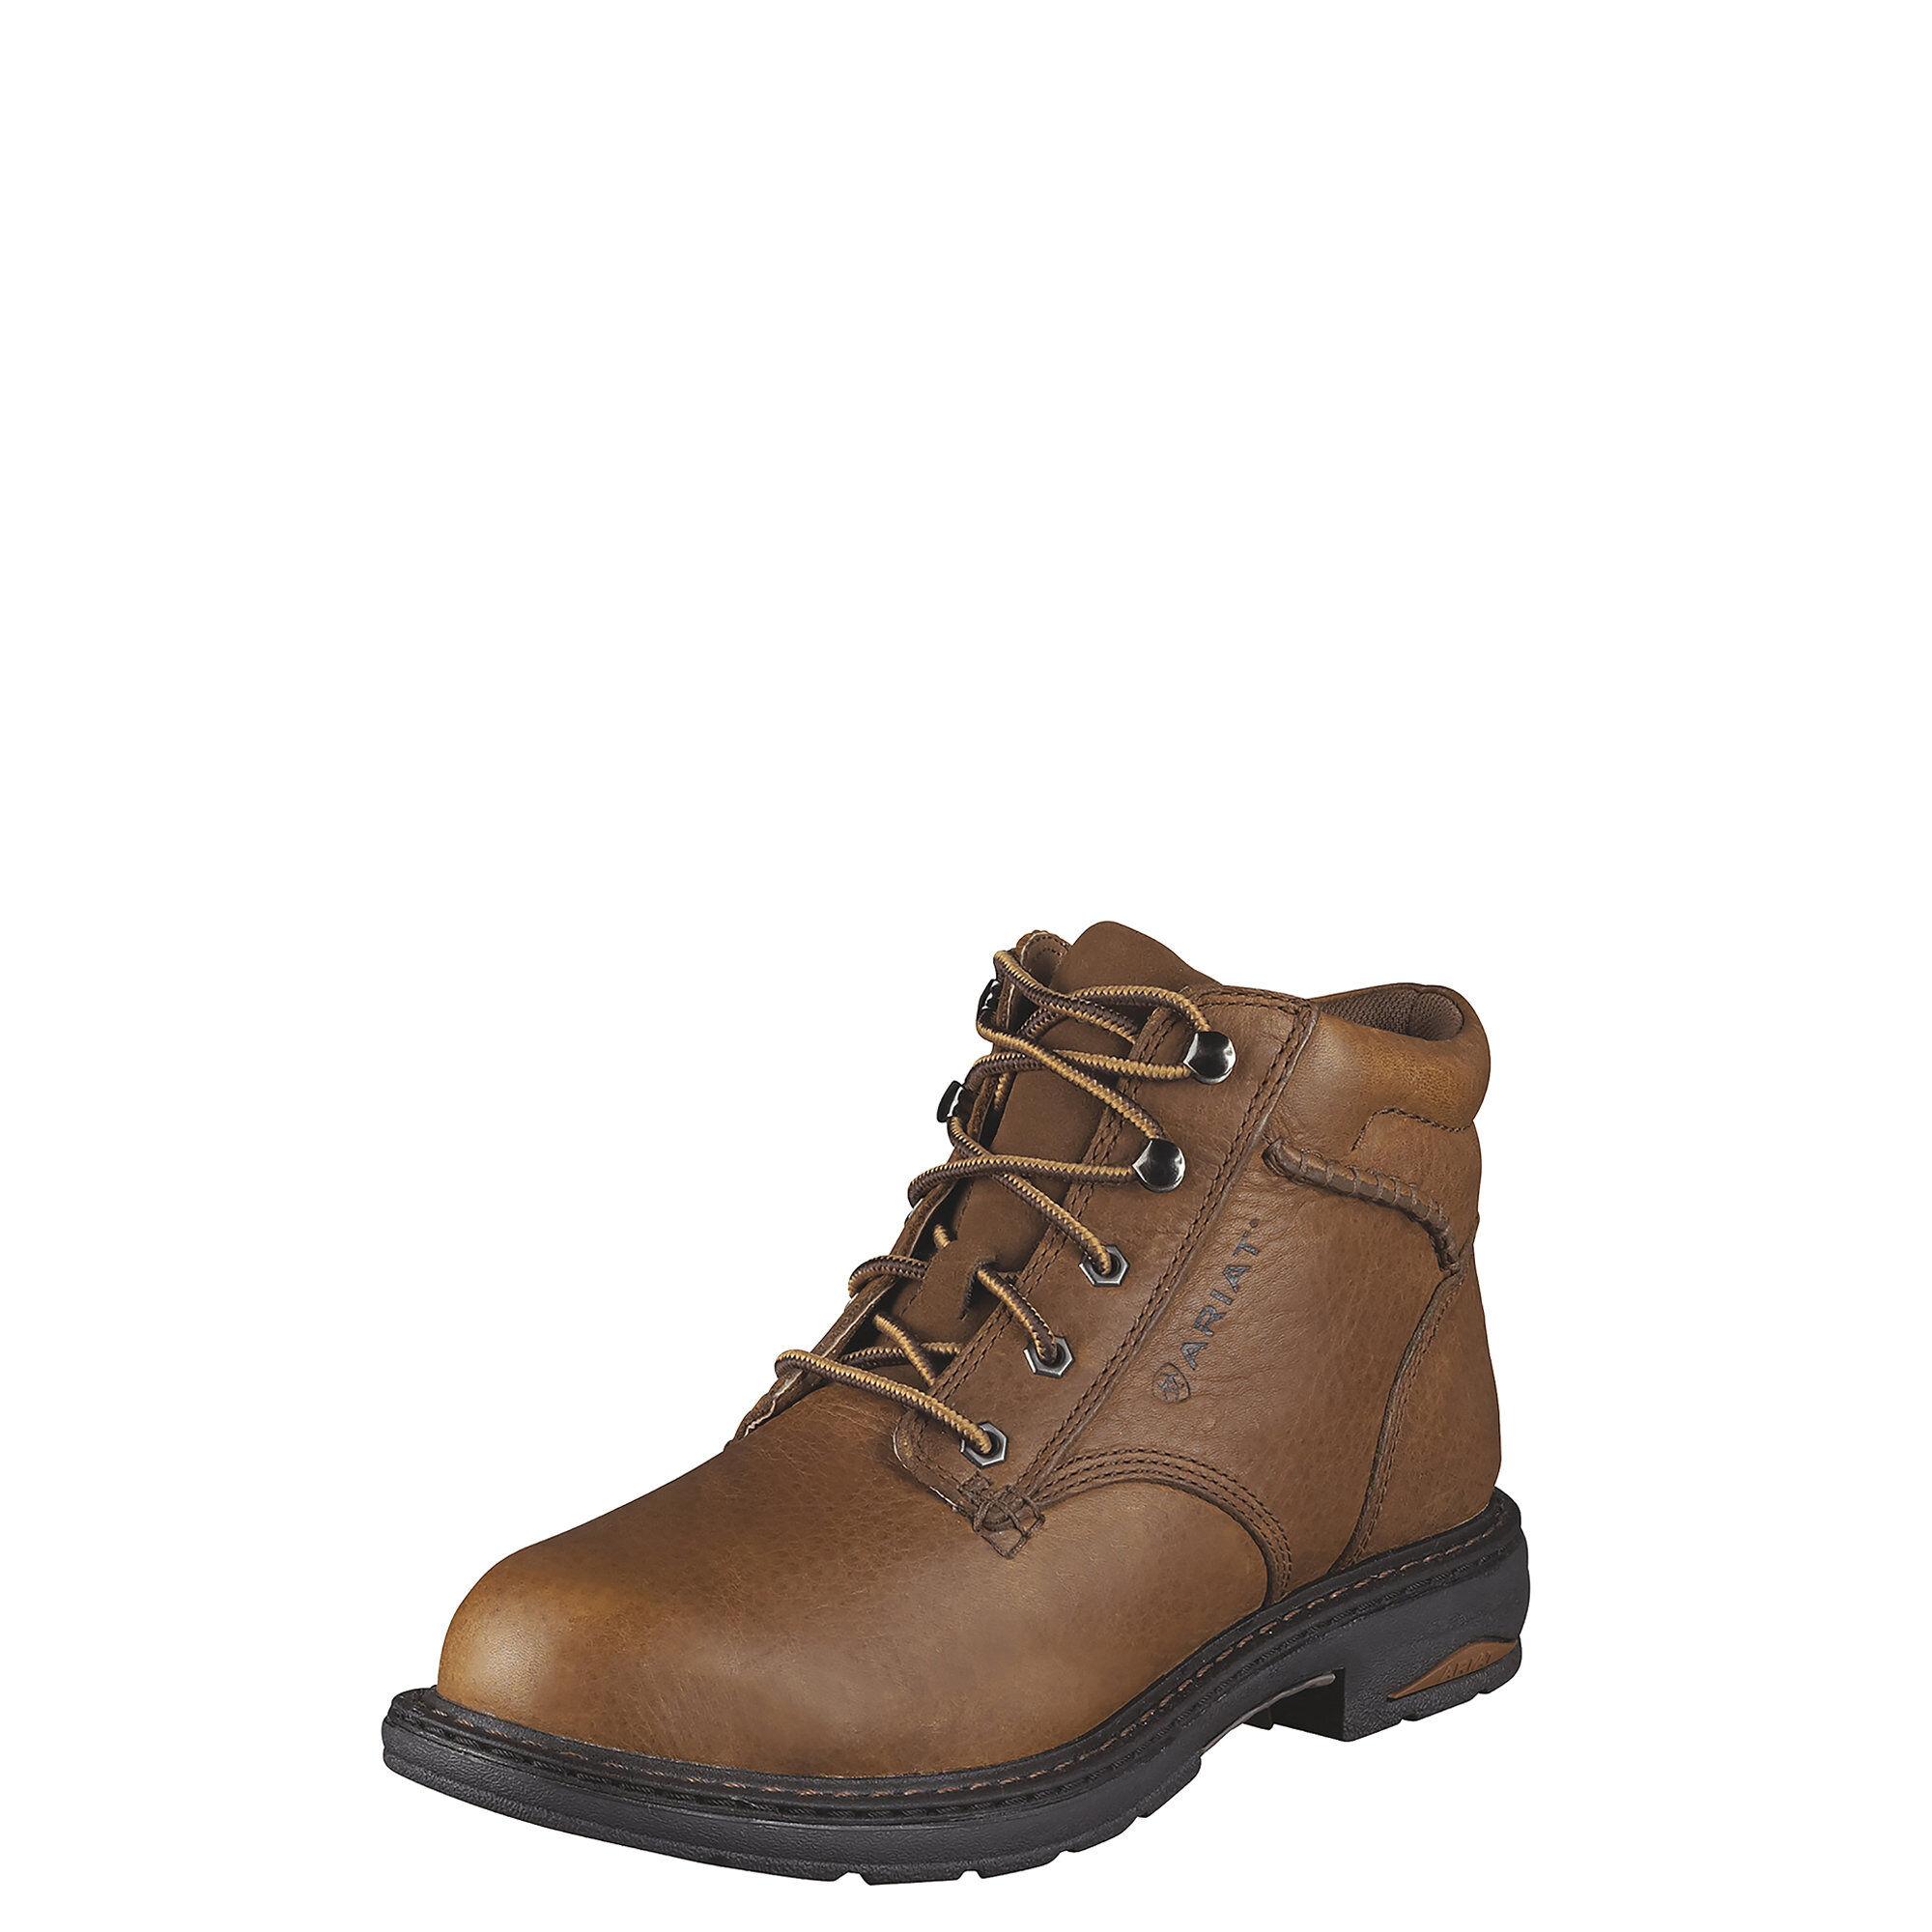 Women's Macey Composite Toe Work Boots in Dark Peanut by Ariat